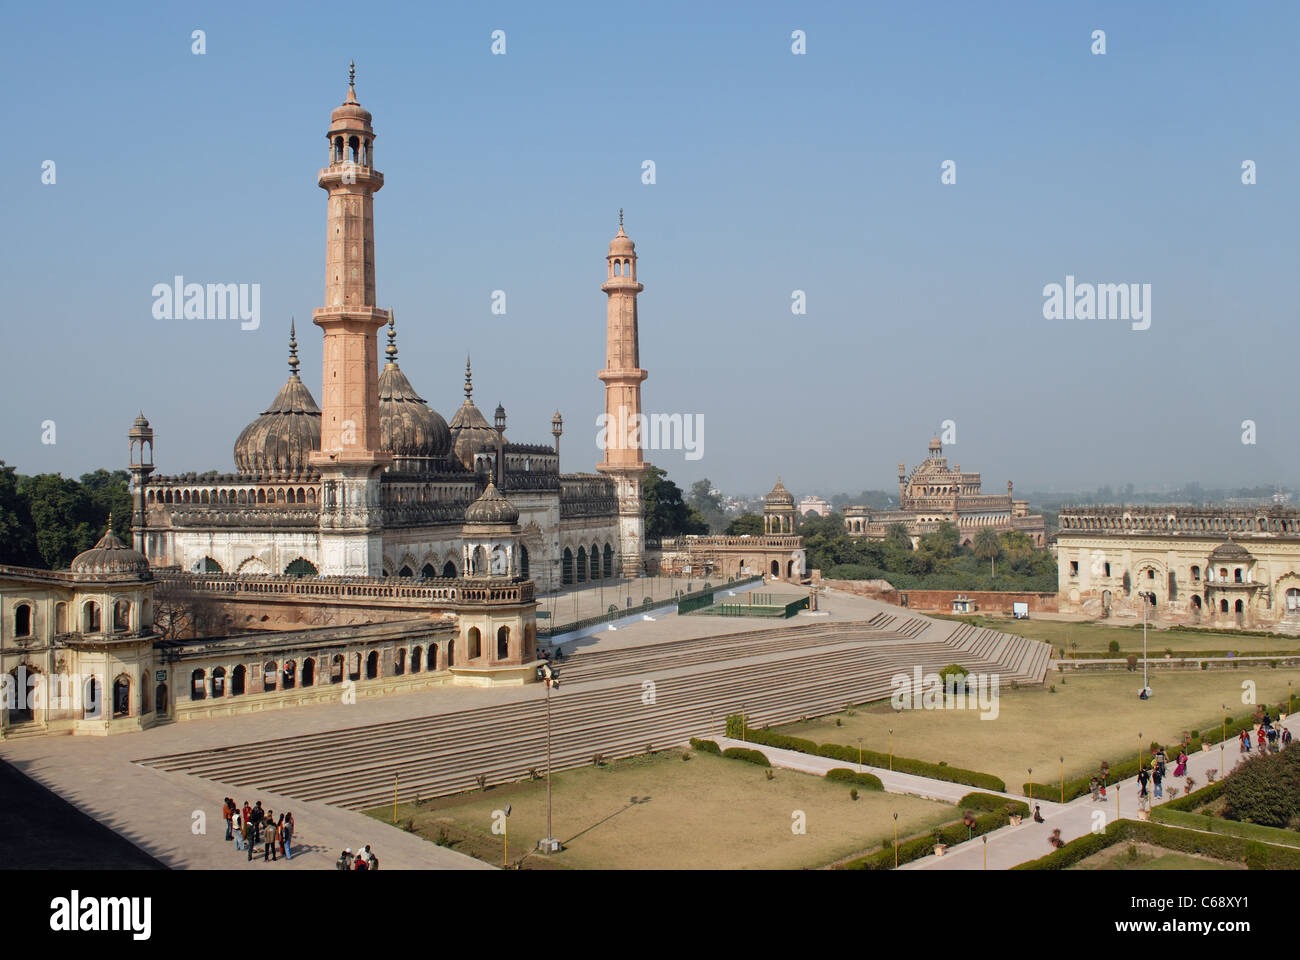 Asfi Masjid in Bara Imambara, Lucknow, Utter Pradesh, India. - Stock Image